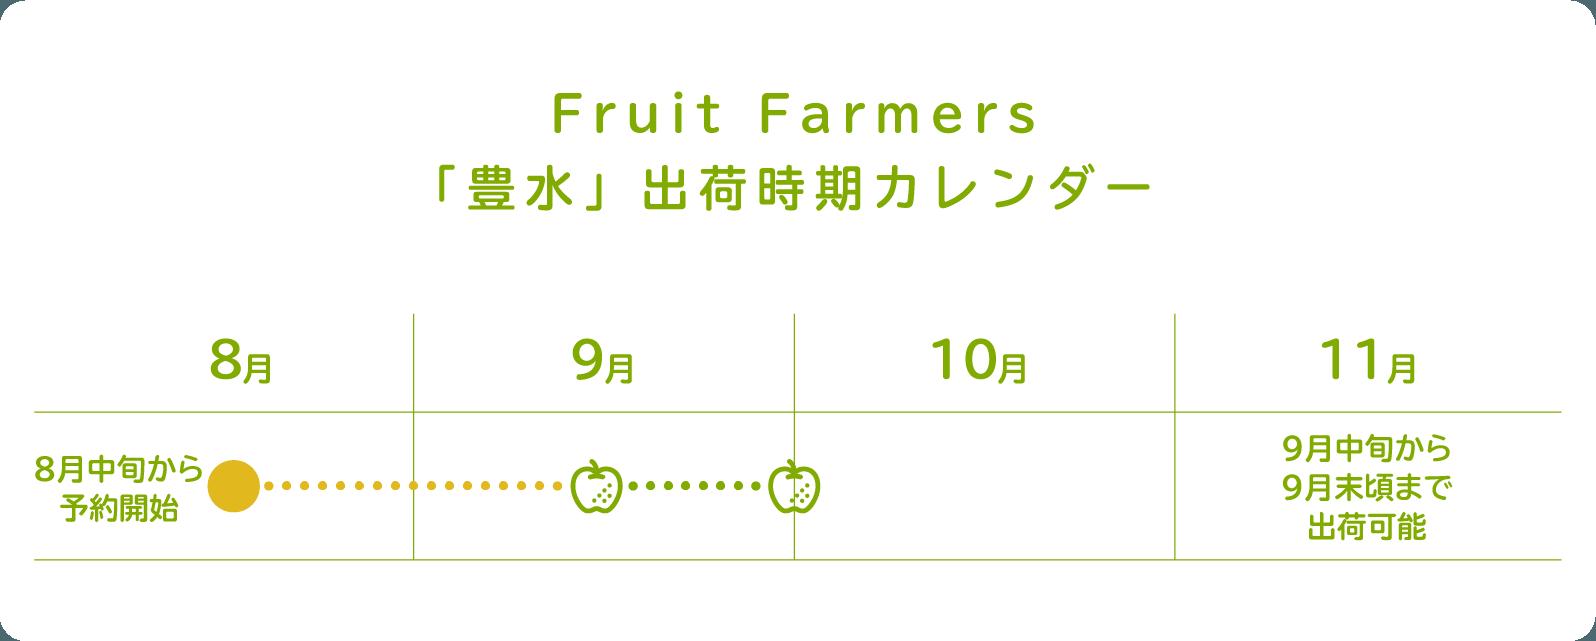 Fruit Farmers「豊水」出荷時期カレンダー